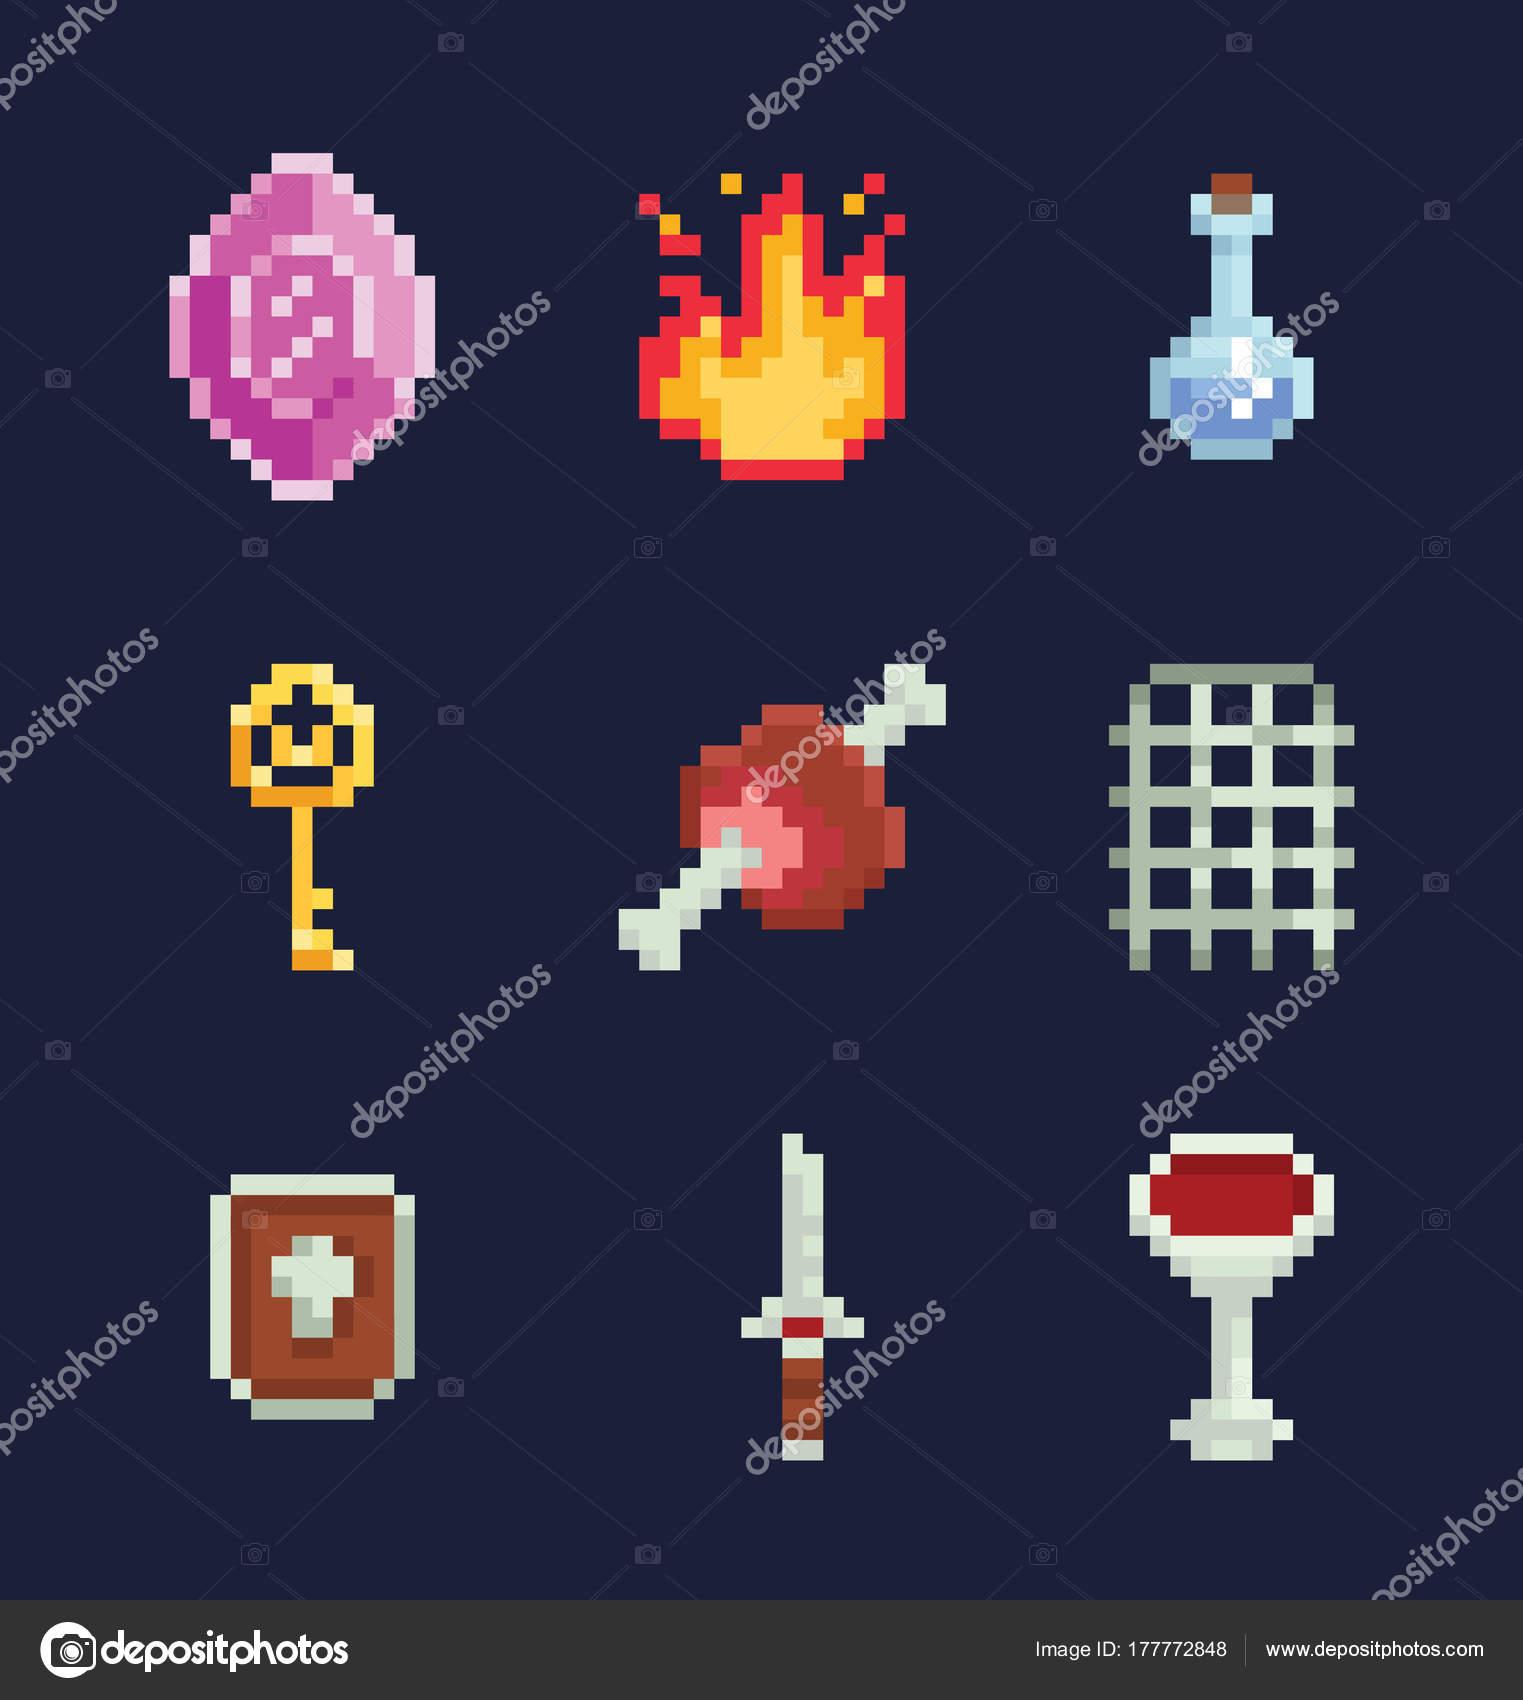 Vector pixel art illustration isons for fantasy adventure